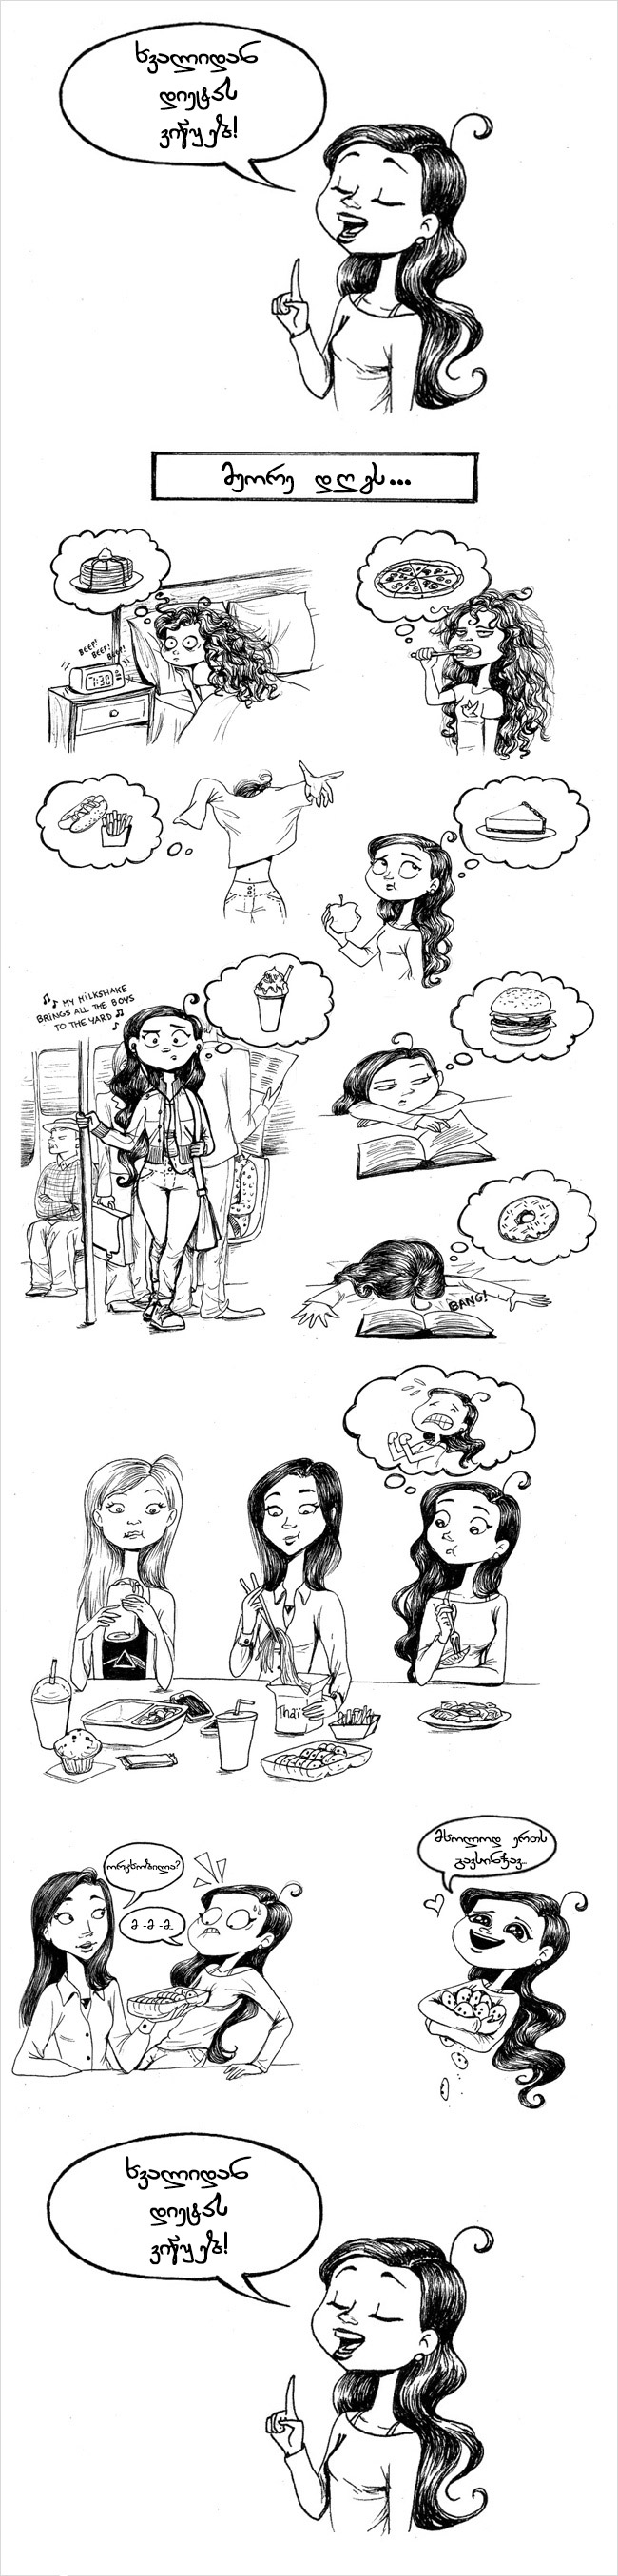 modern_girls_everyday_problems_7